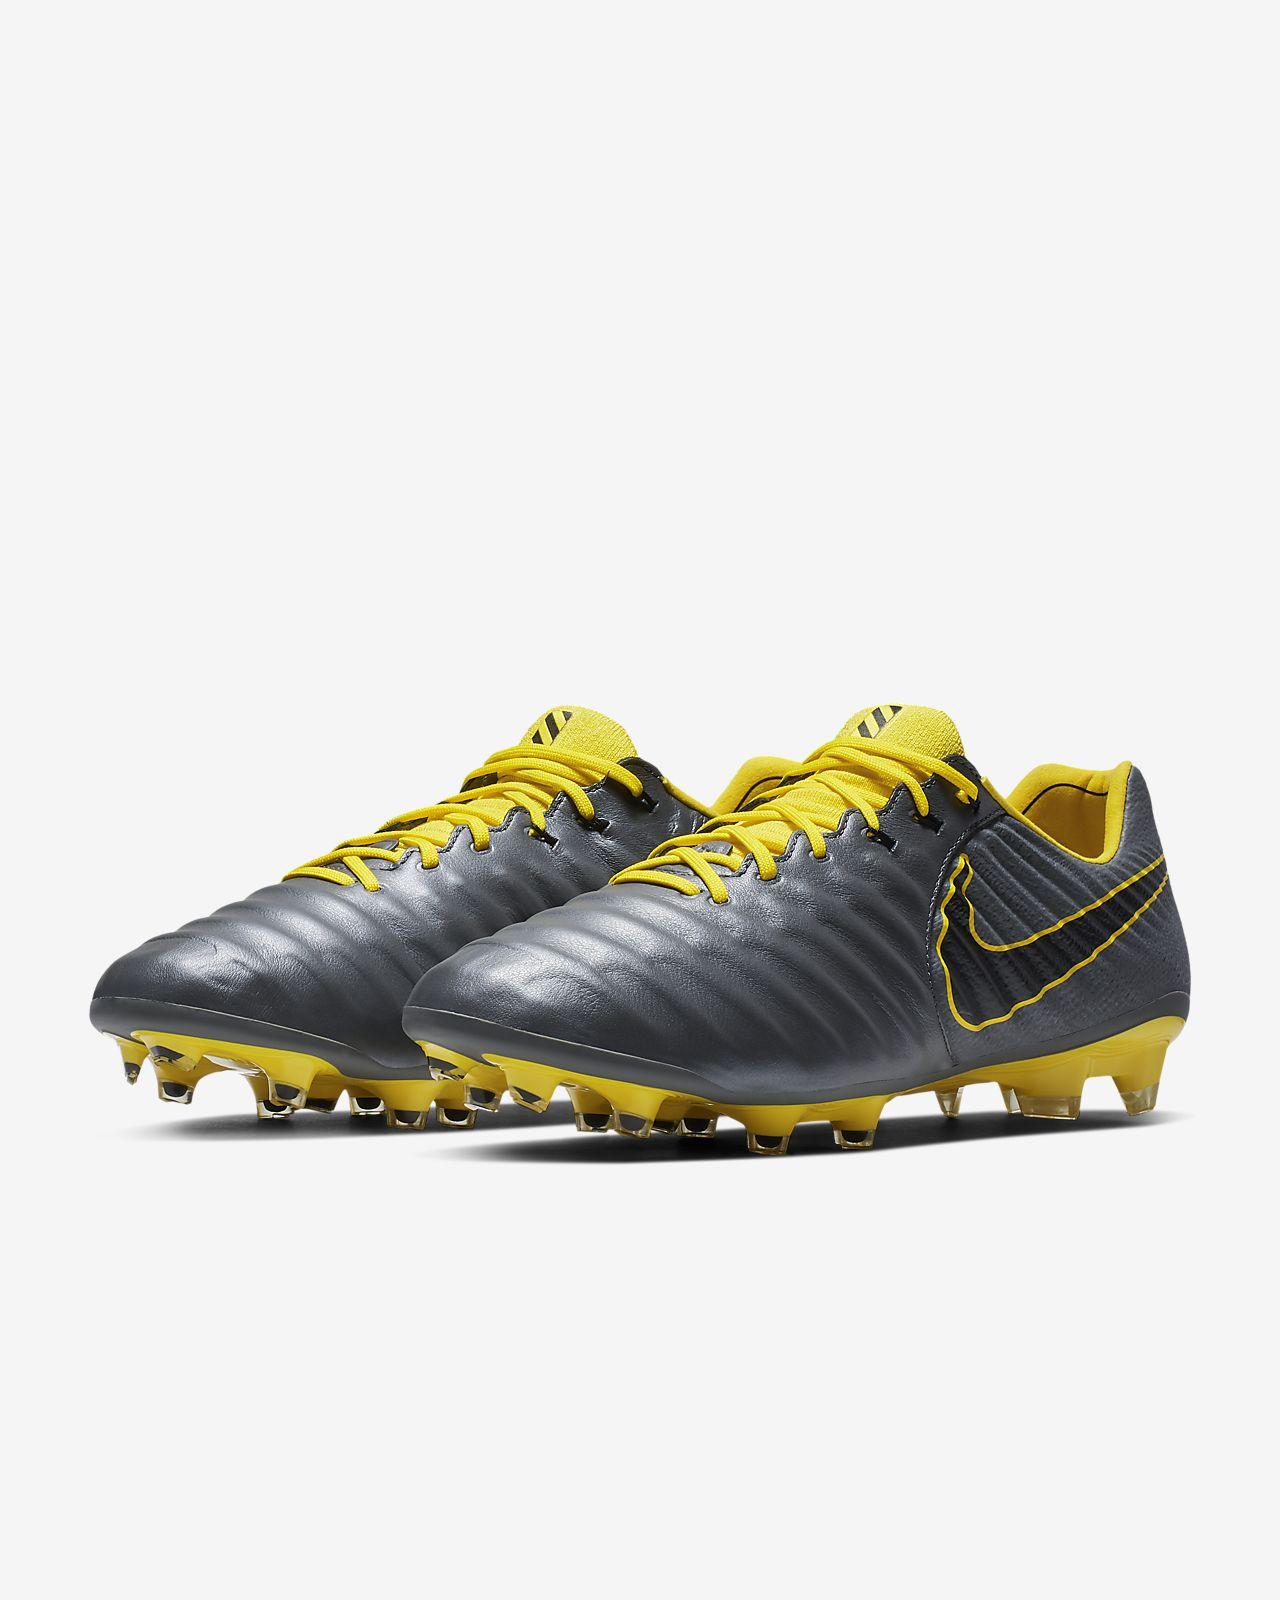 74ad05e1cac Nike Legend 7 Elite FG Game Over Firm-Ground Football Boot. Nike.com AT